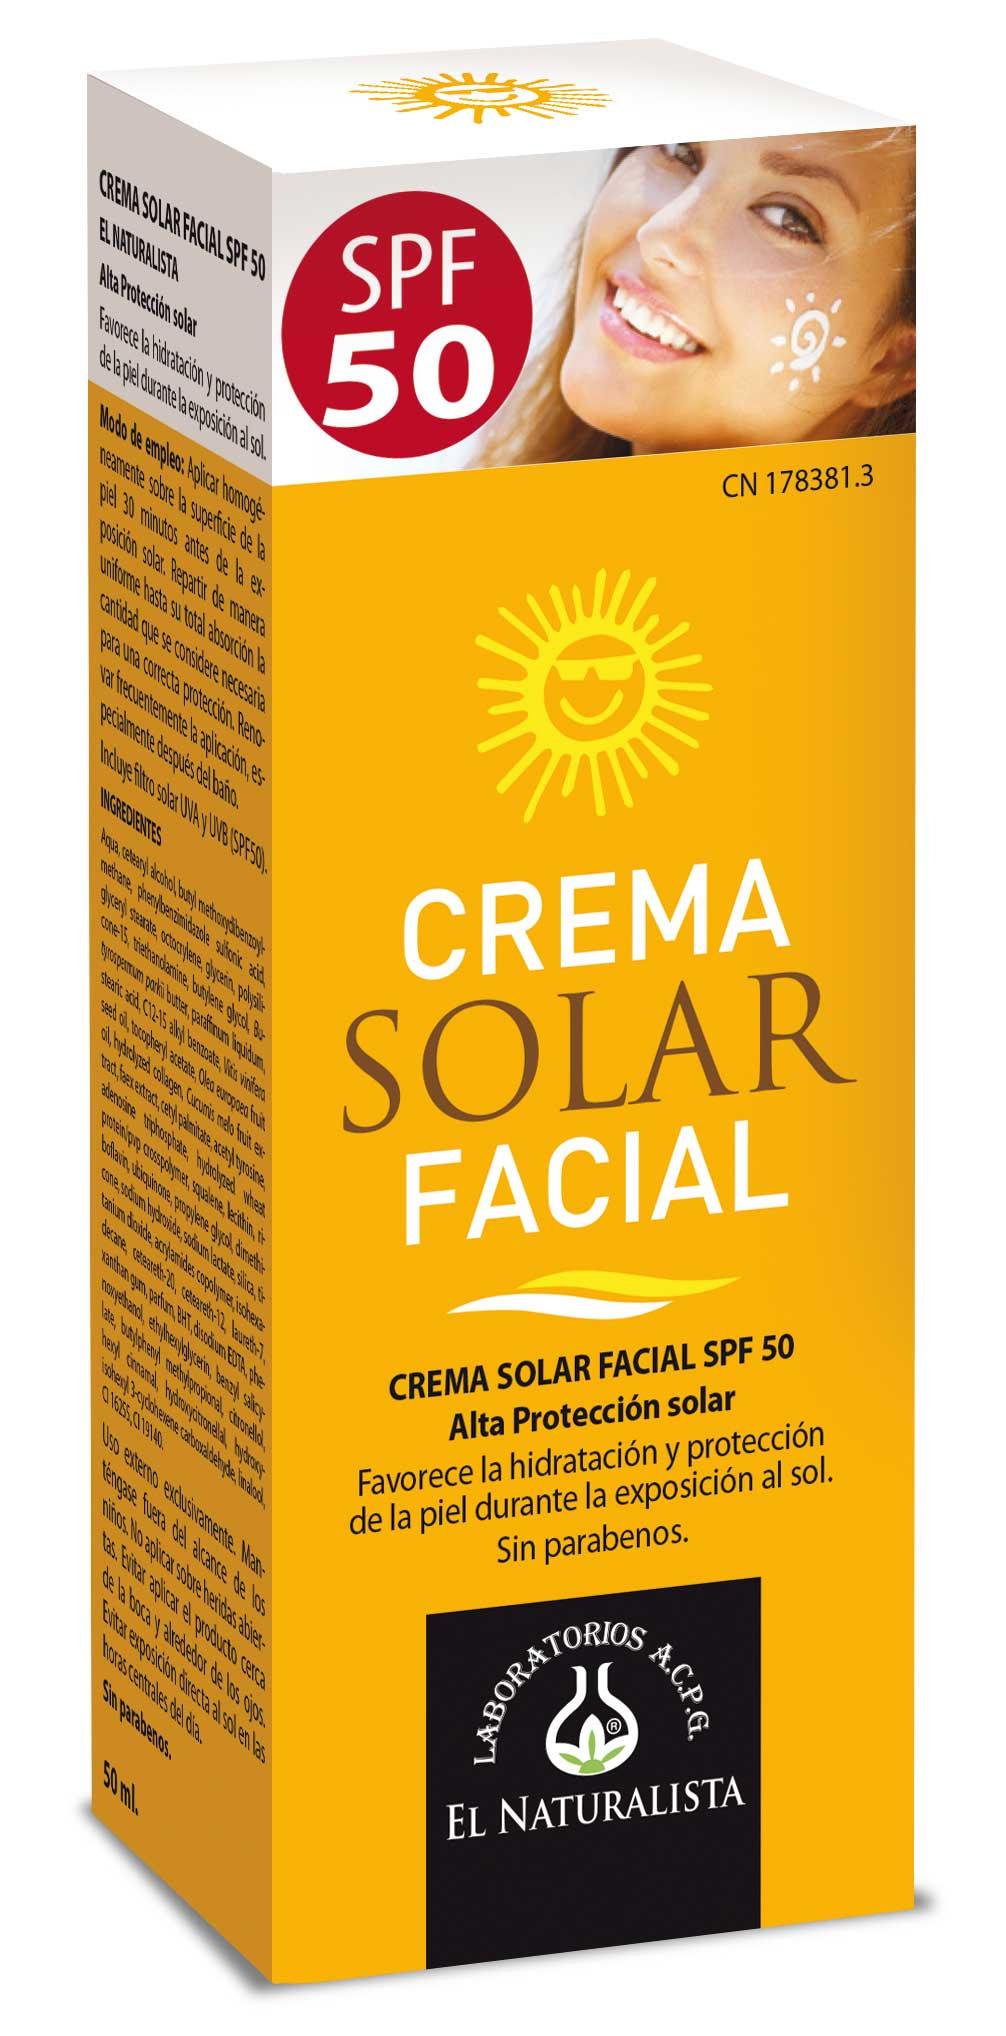 Facial-Solarweb